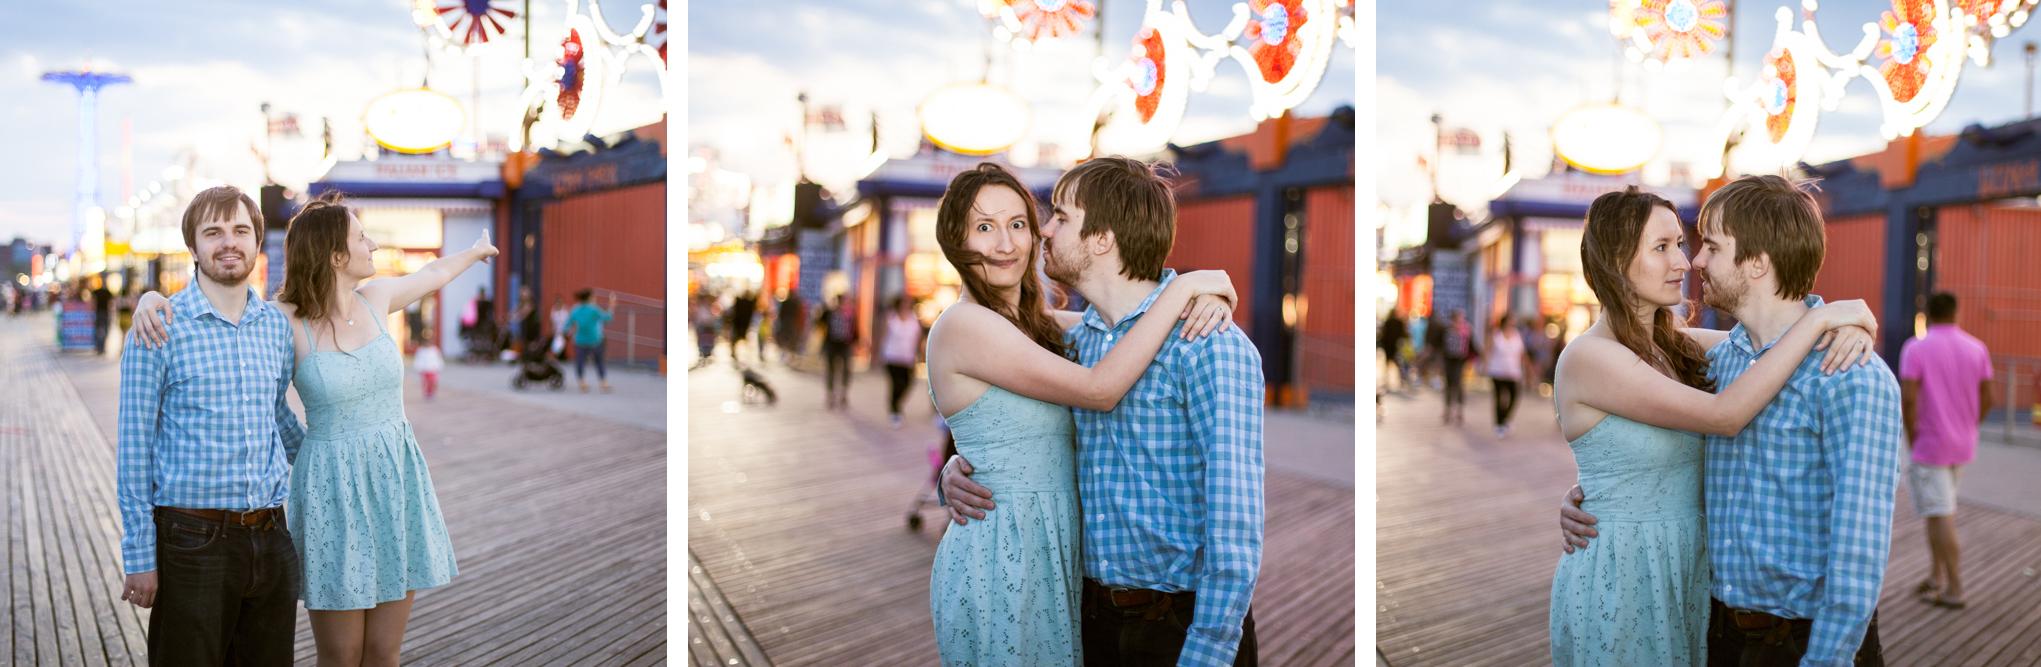 Coney-Island-Engagement-Photography-3-final.jpg